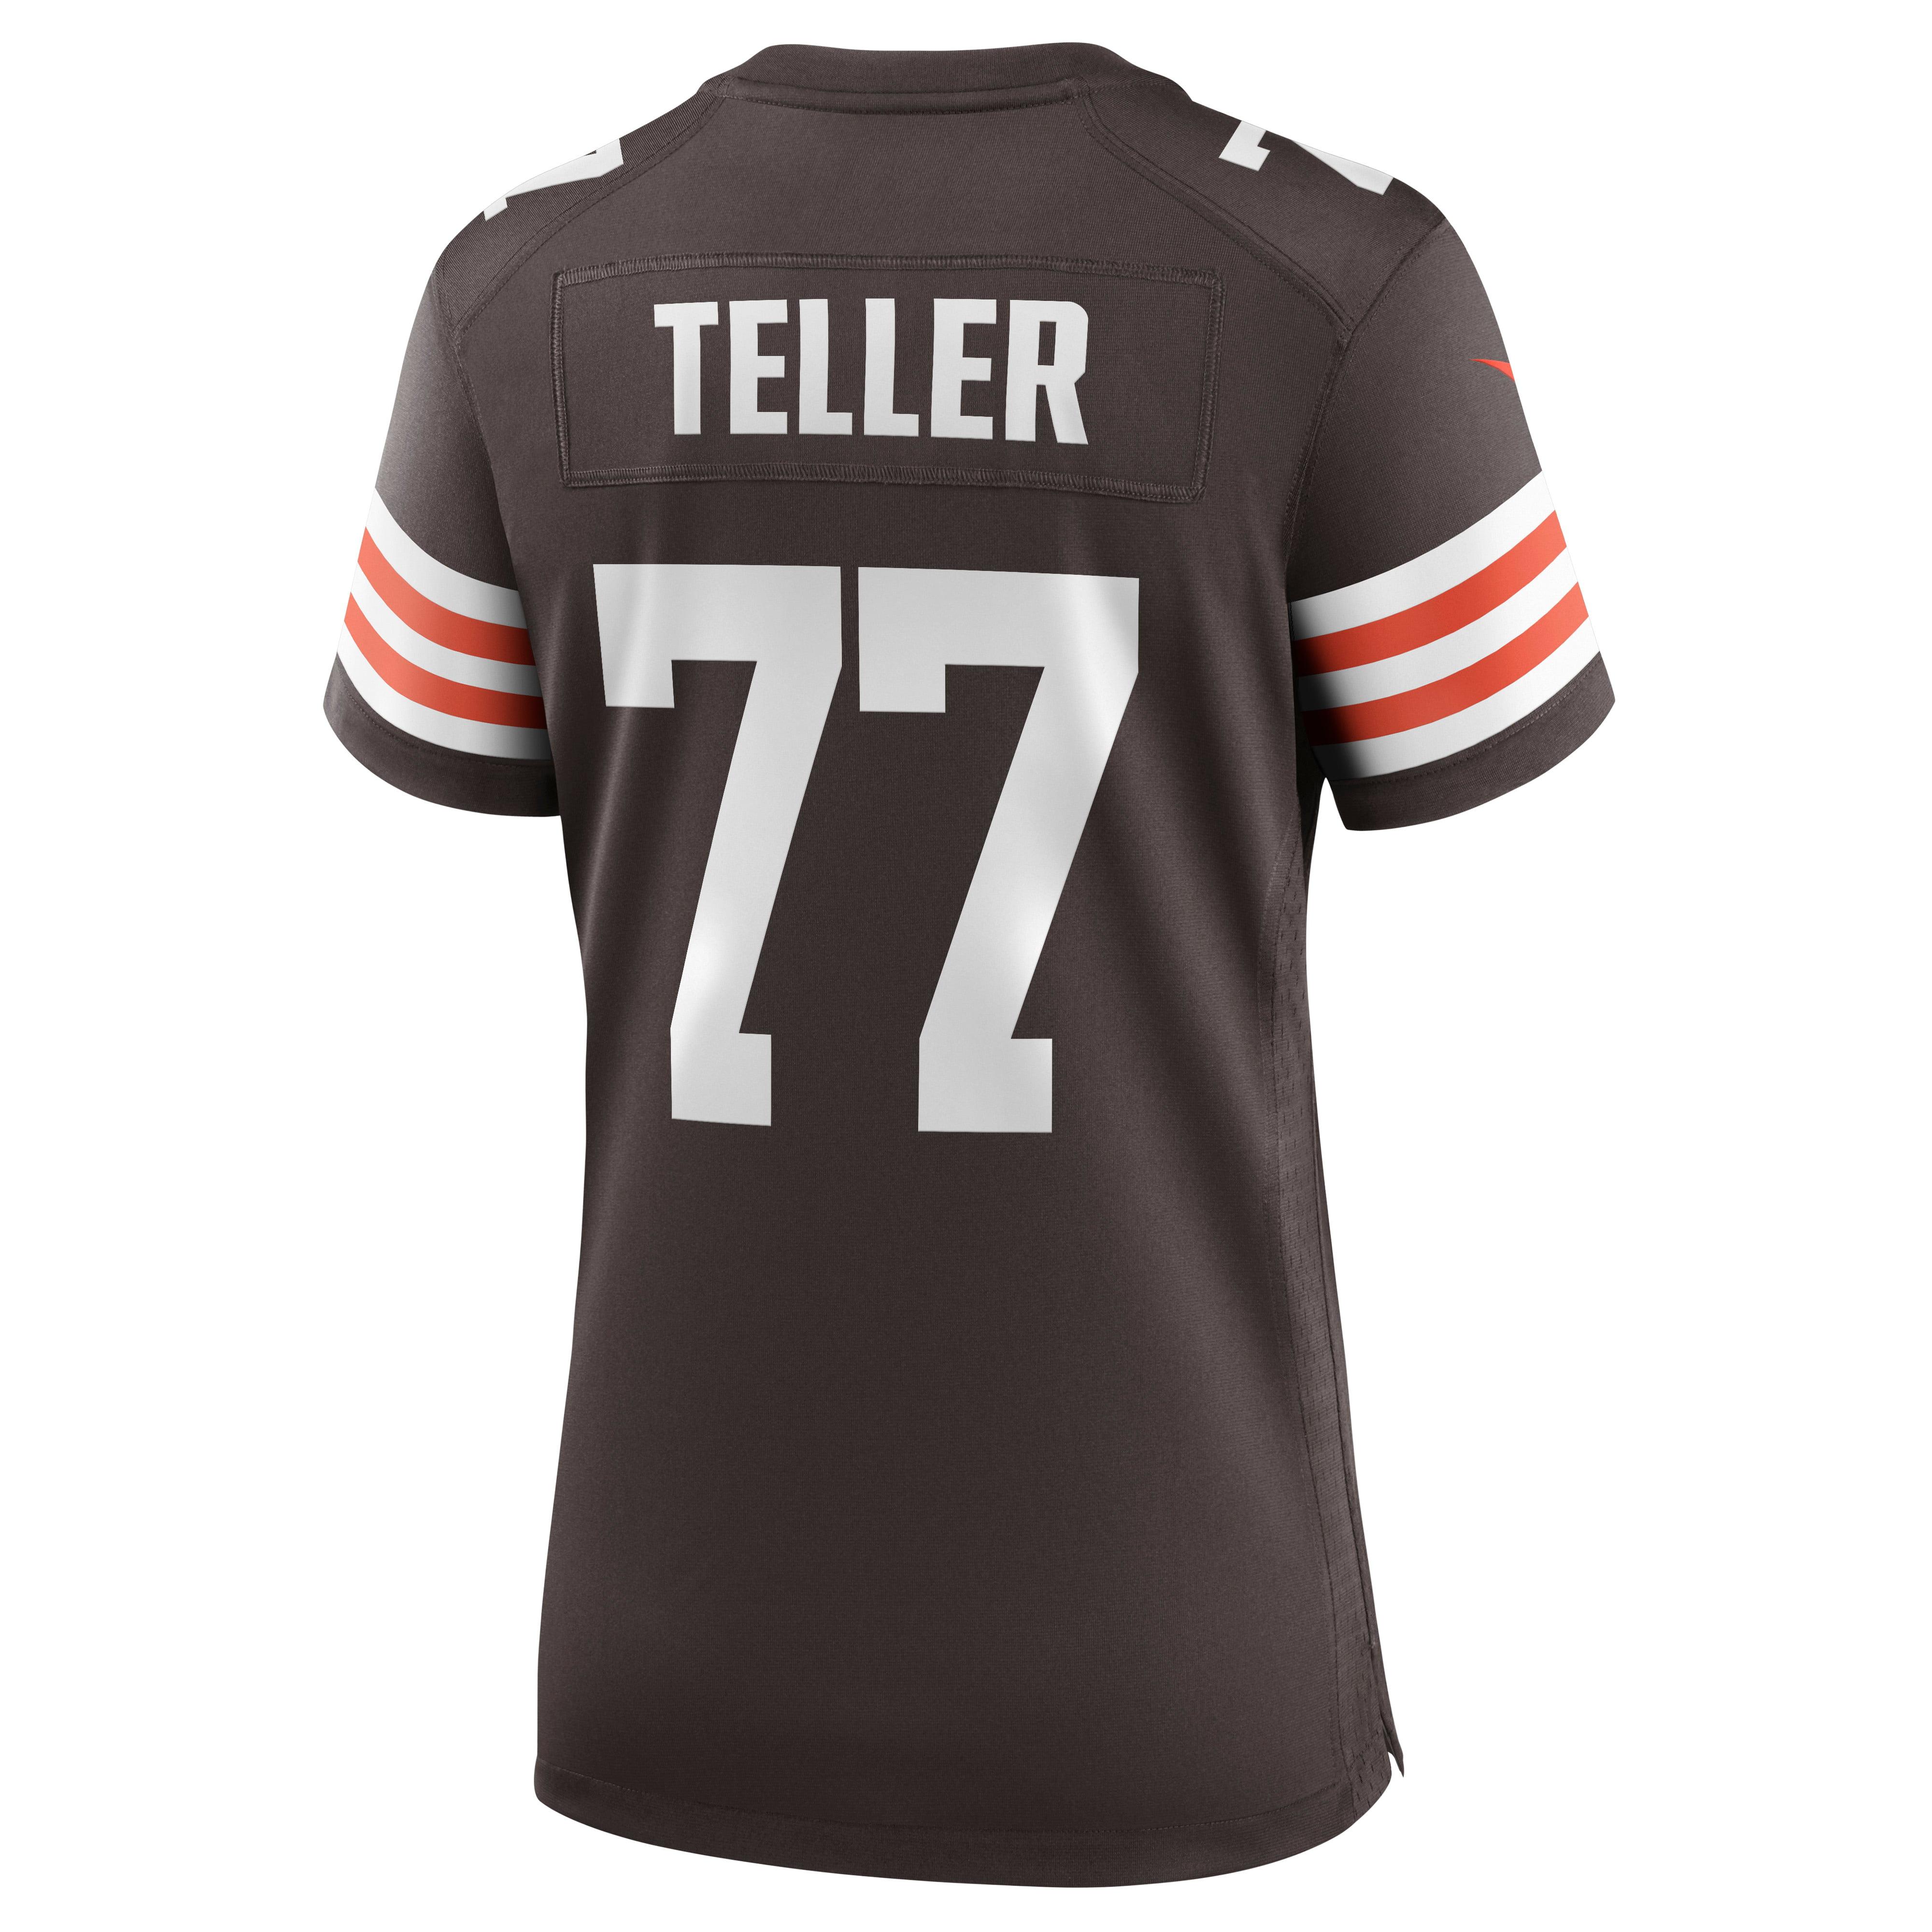 Wyatt Teller Cleveland Browns Nike Women's Game Jersey - Brown